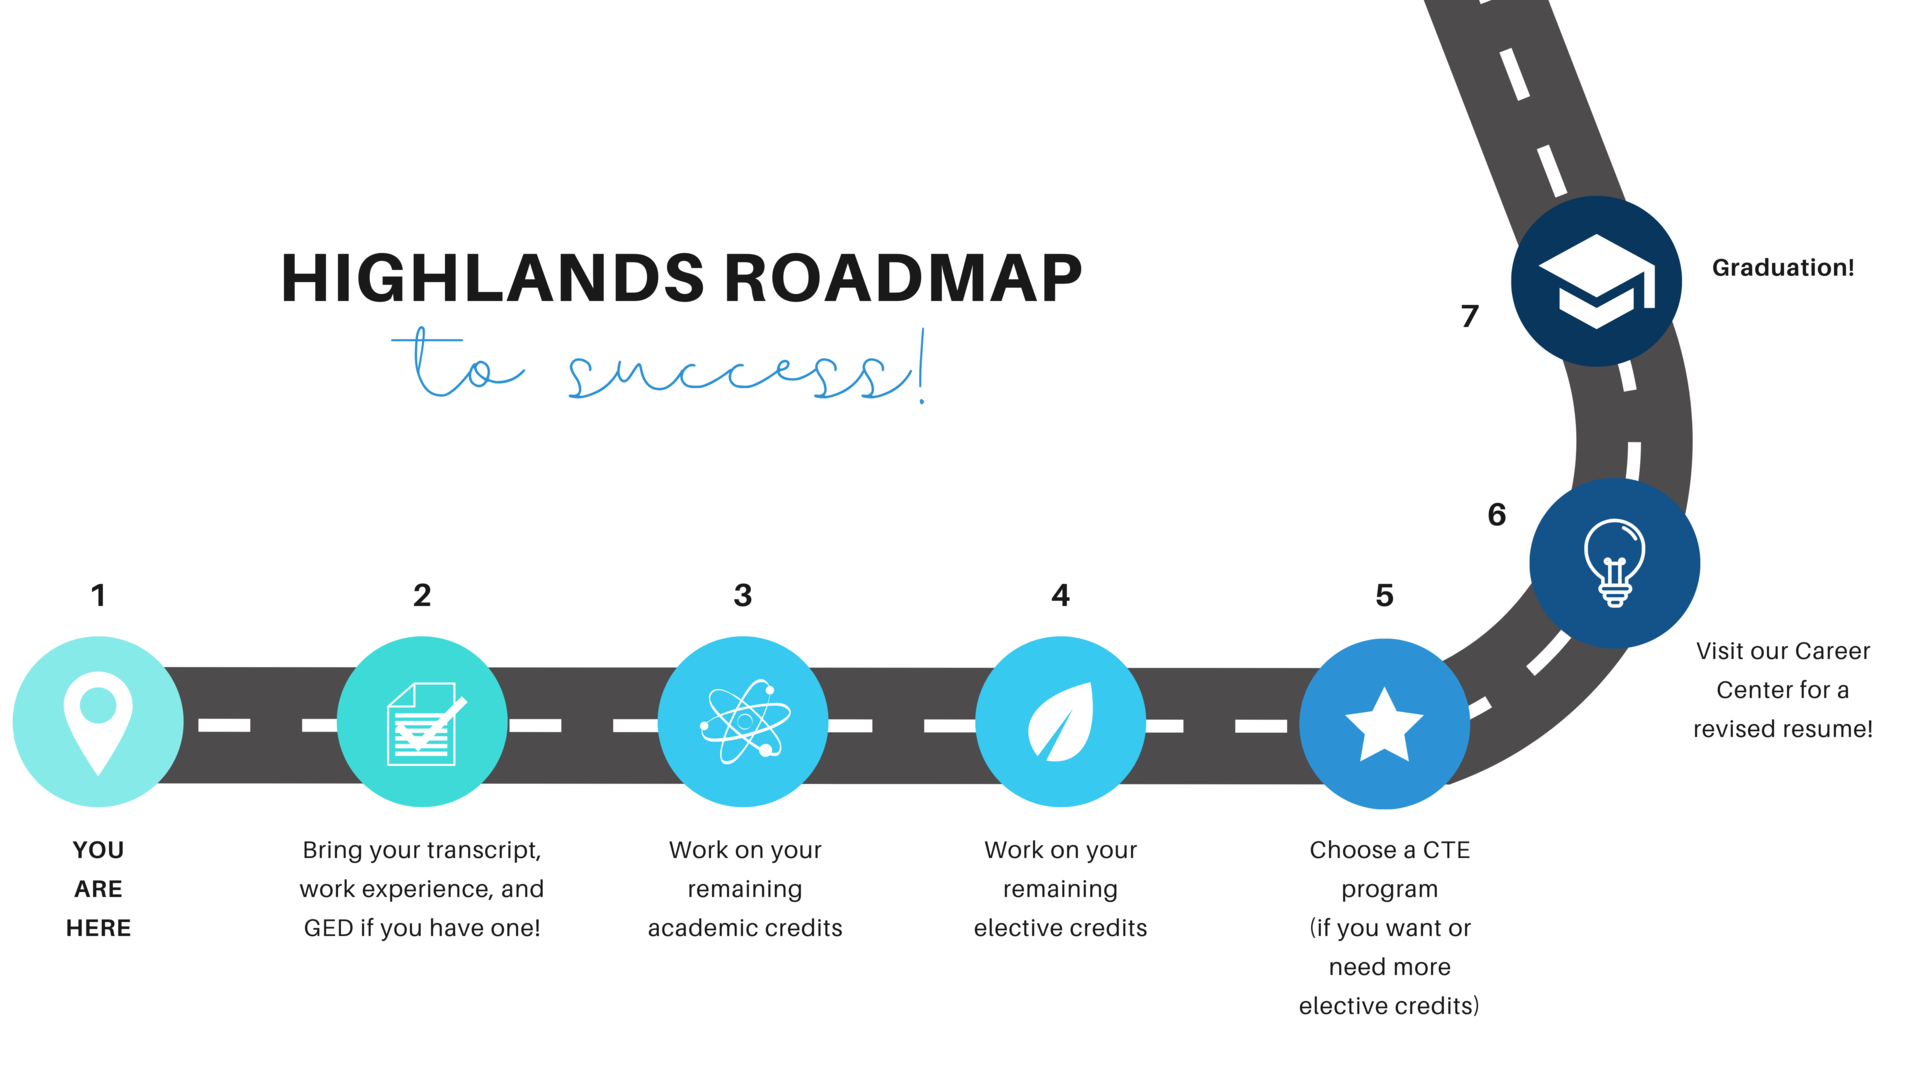 Highlands roadmap